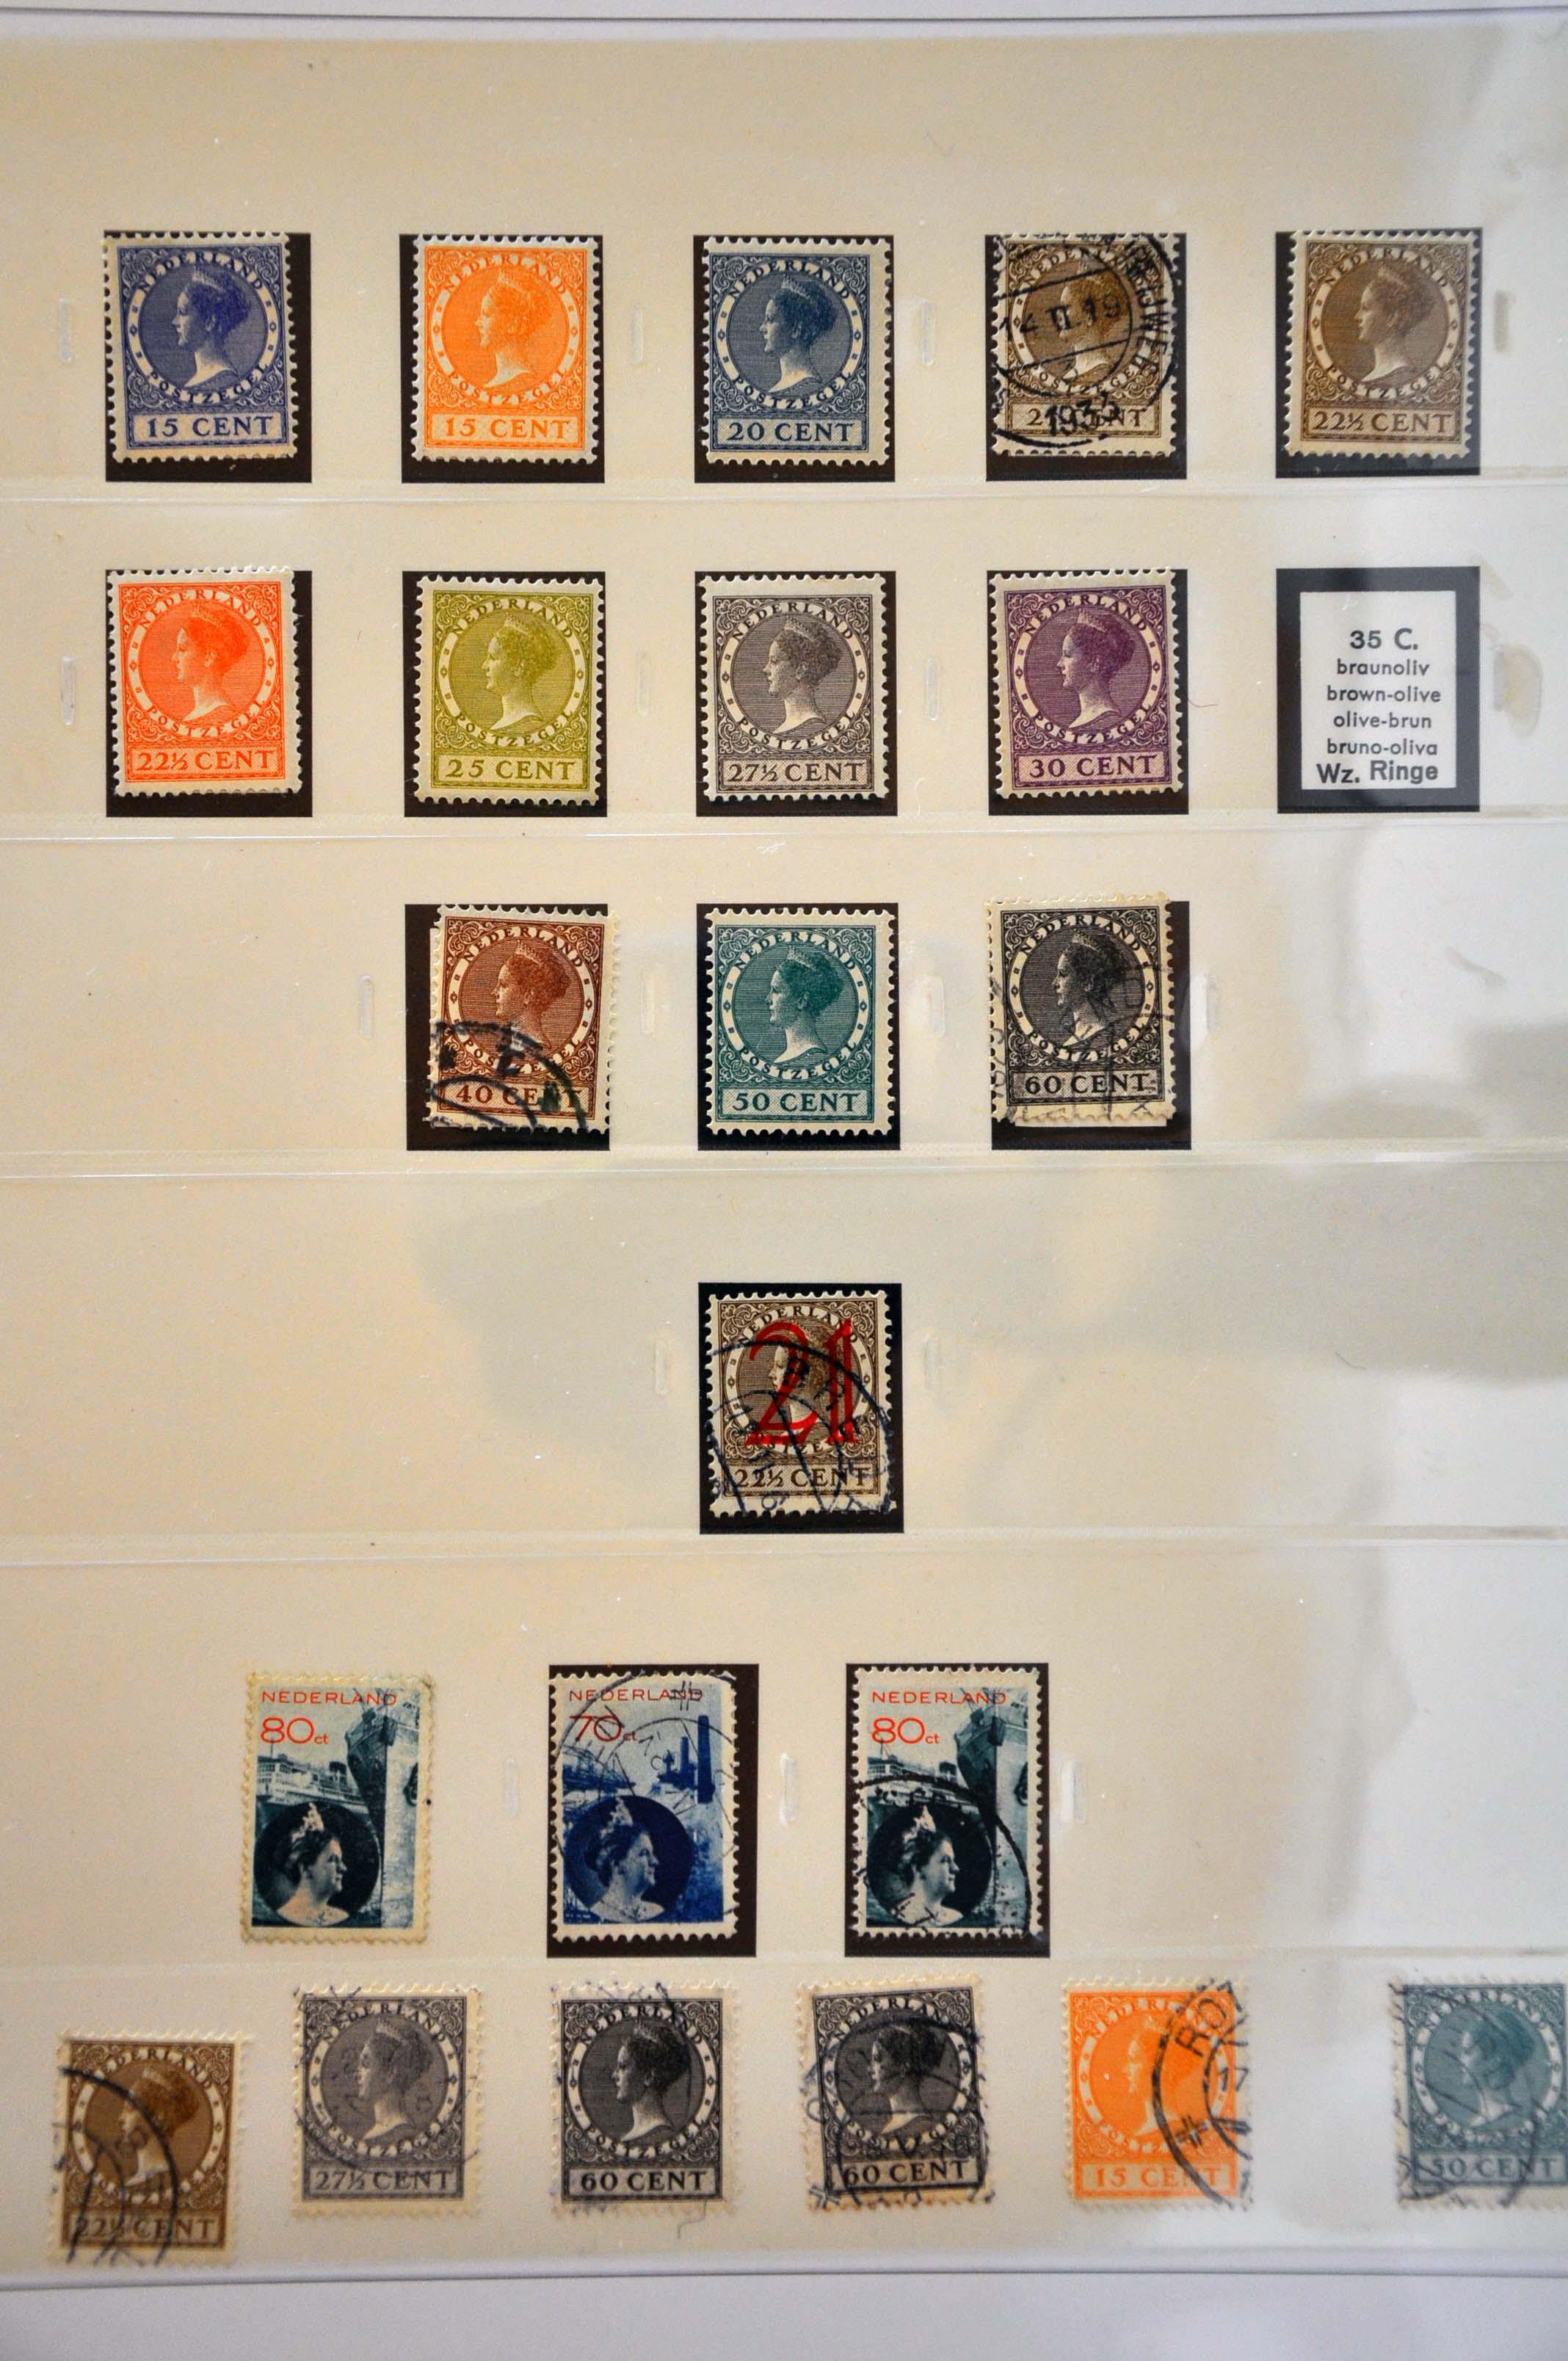 Lot 1788 - Netherlands and former colonies Netherlands -  Corinphila Veilingen Auction 242: General sale